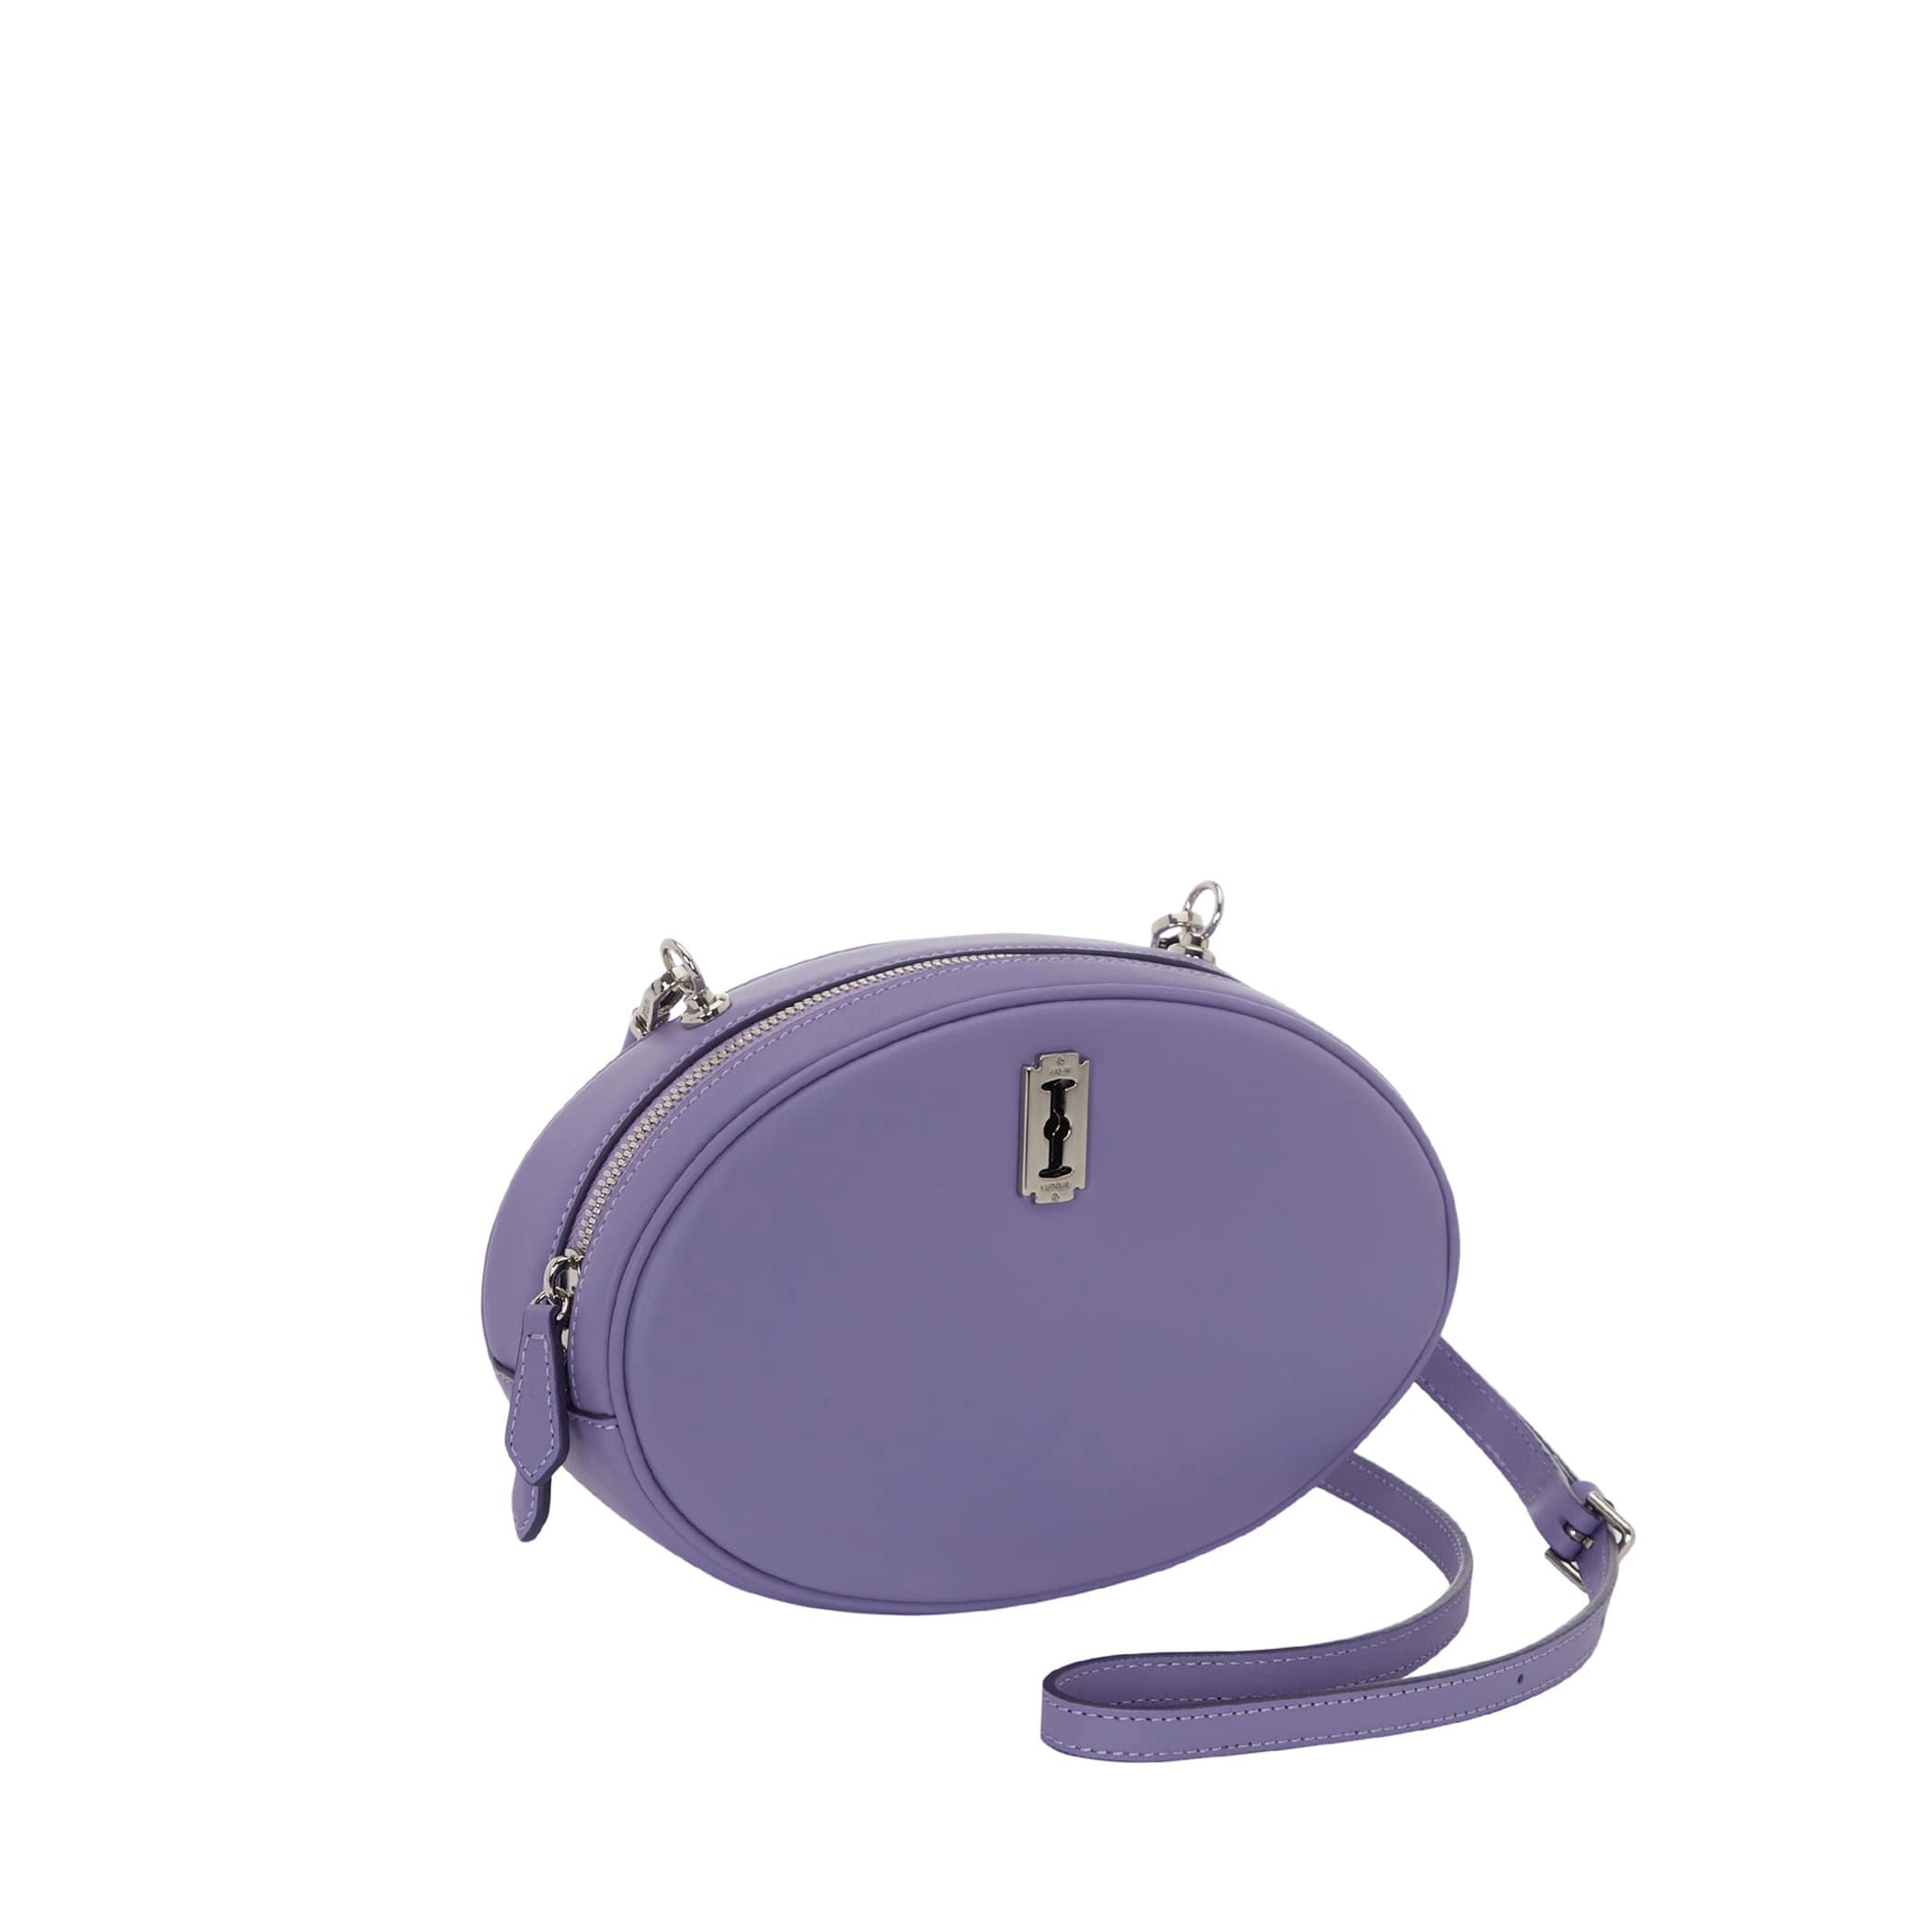 Mercury Round Shoulder (머큐리 라운드 숄더) Galaxy Purple